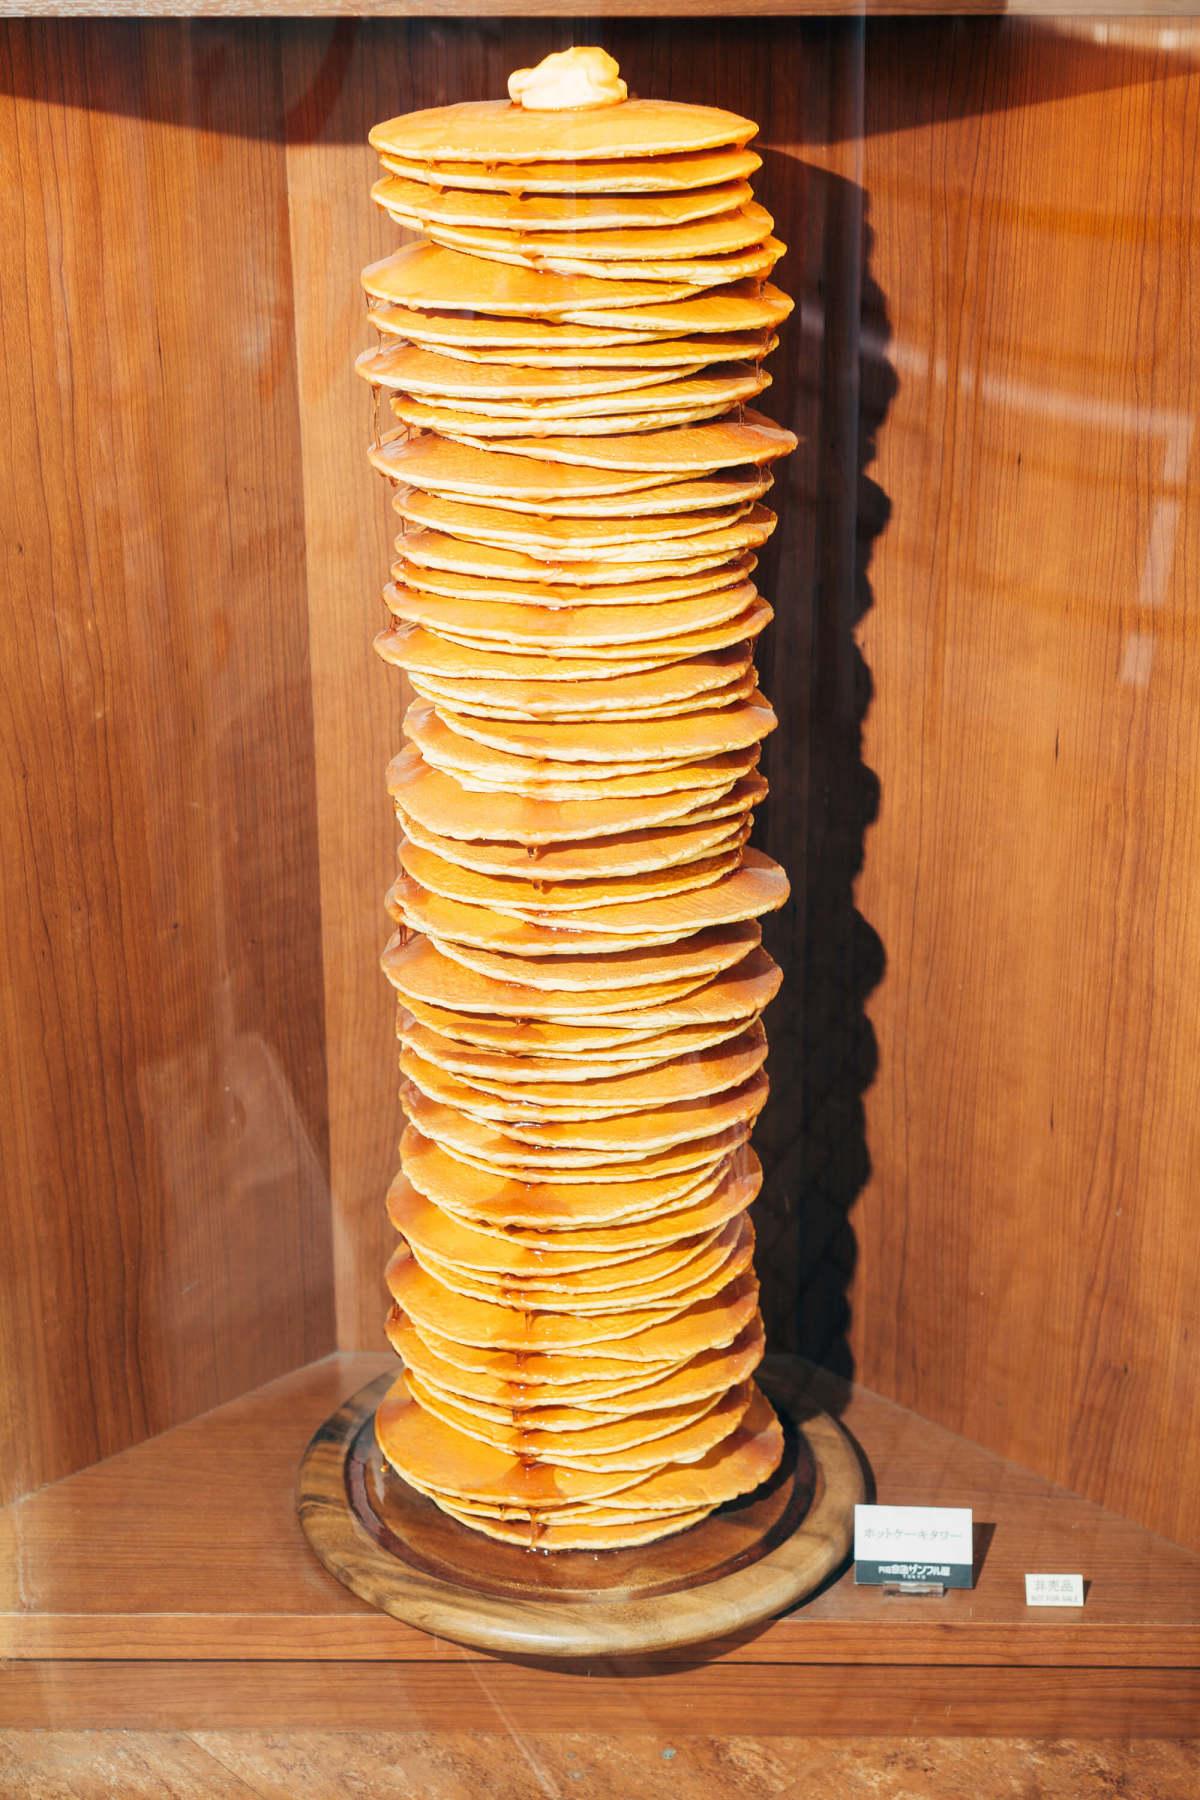 pancakes - Marco Arguello.jpg